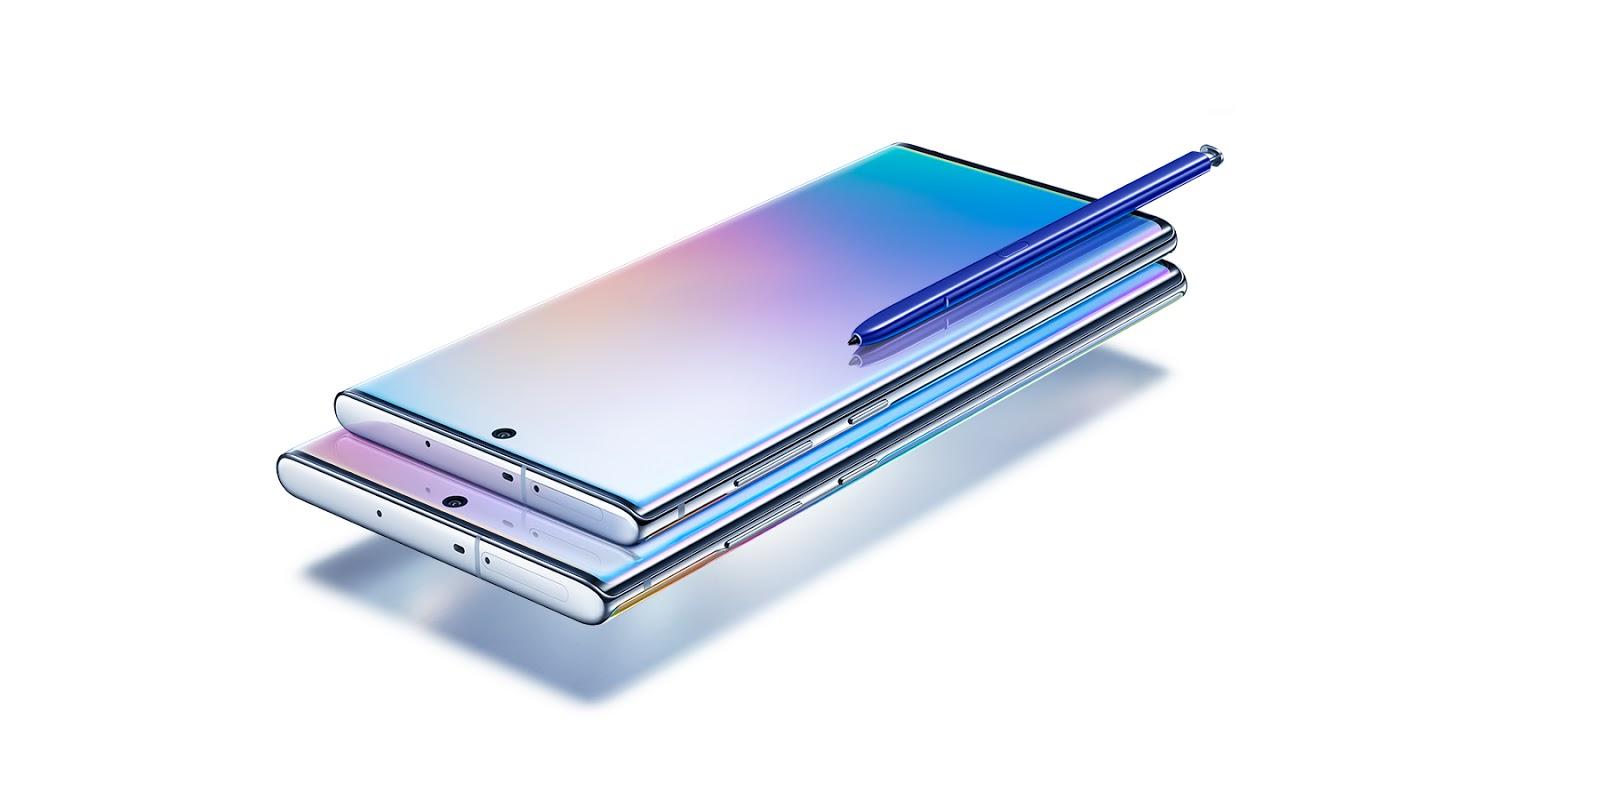 Samsung เปิดตัว Galaxy Note 10 สมาร์ทโฟนทรงพลัง  ทลายทุกขีดจำกัดเดิมๆ เพื่อตอบโจทย์กลุ่มคนทำงานรุ่นใหม่ หรือ New Work Tribe